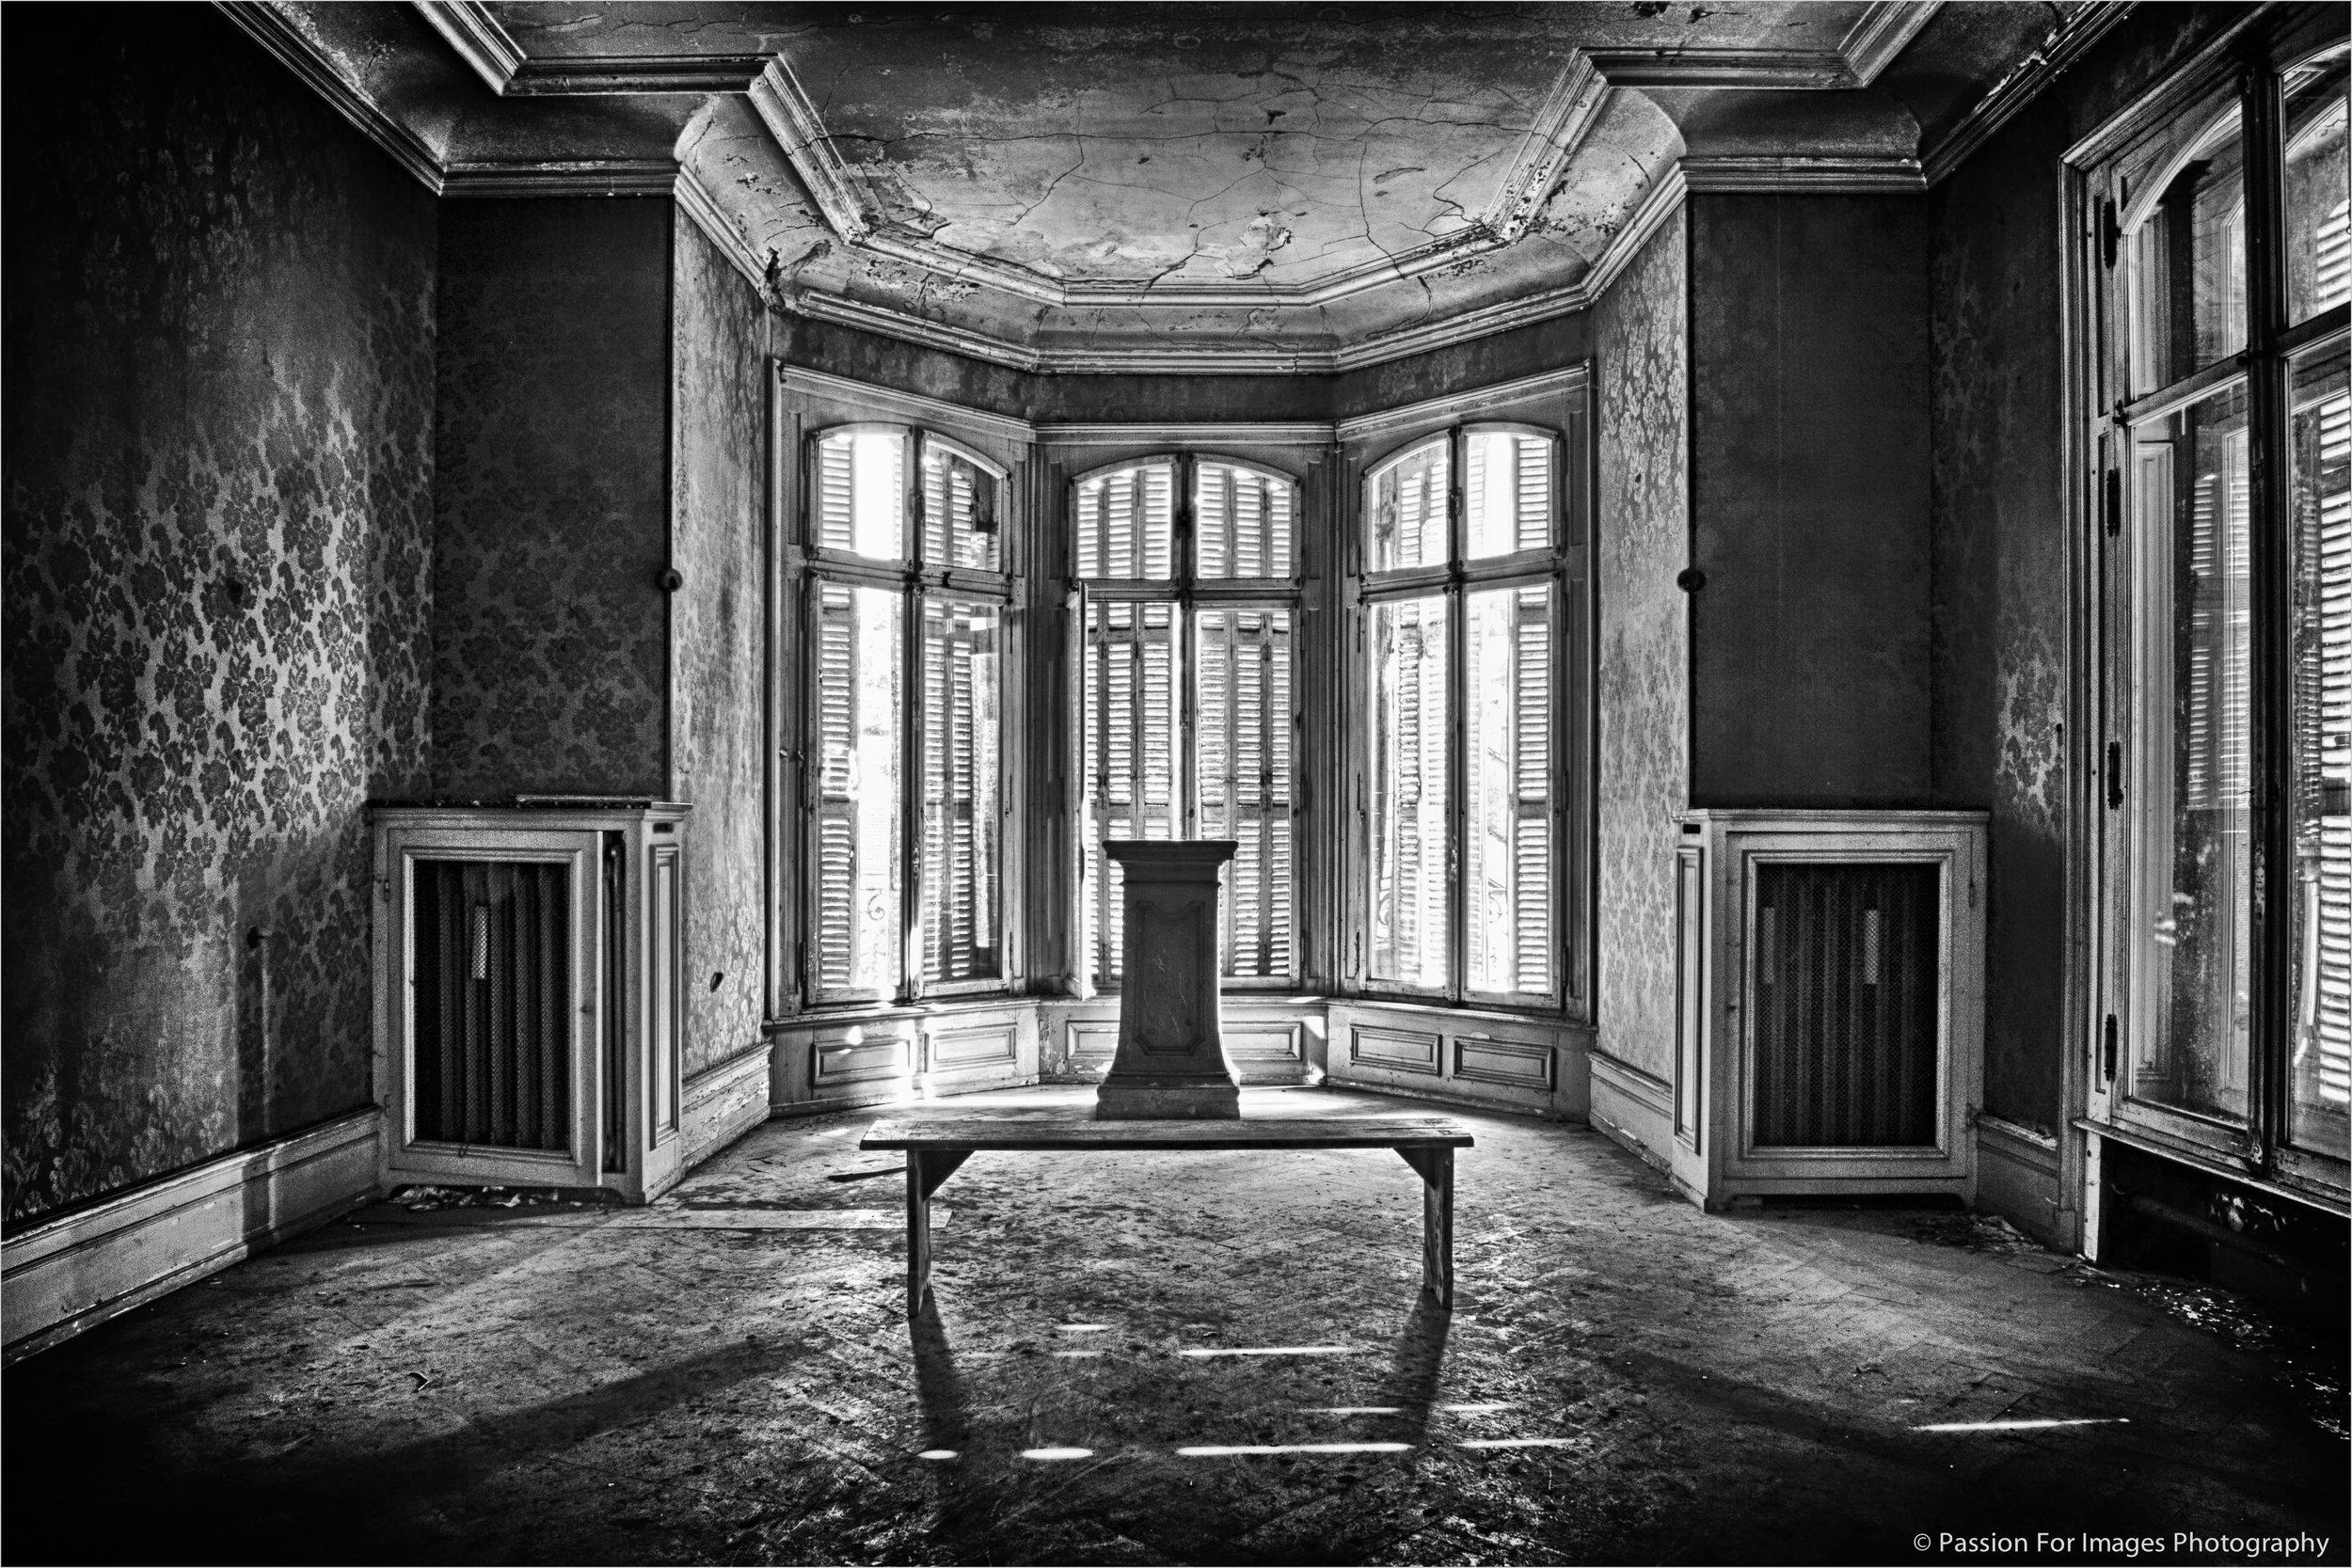 PFI__D7C0629_2014_08_Chateau_Lumiere_HDR-Edit.jpg